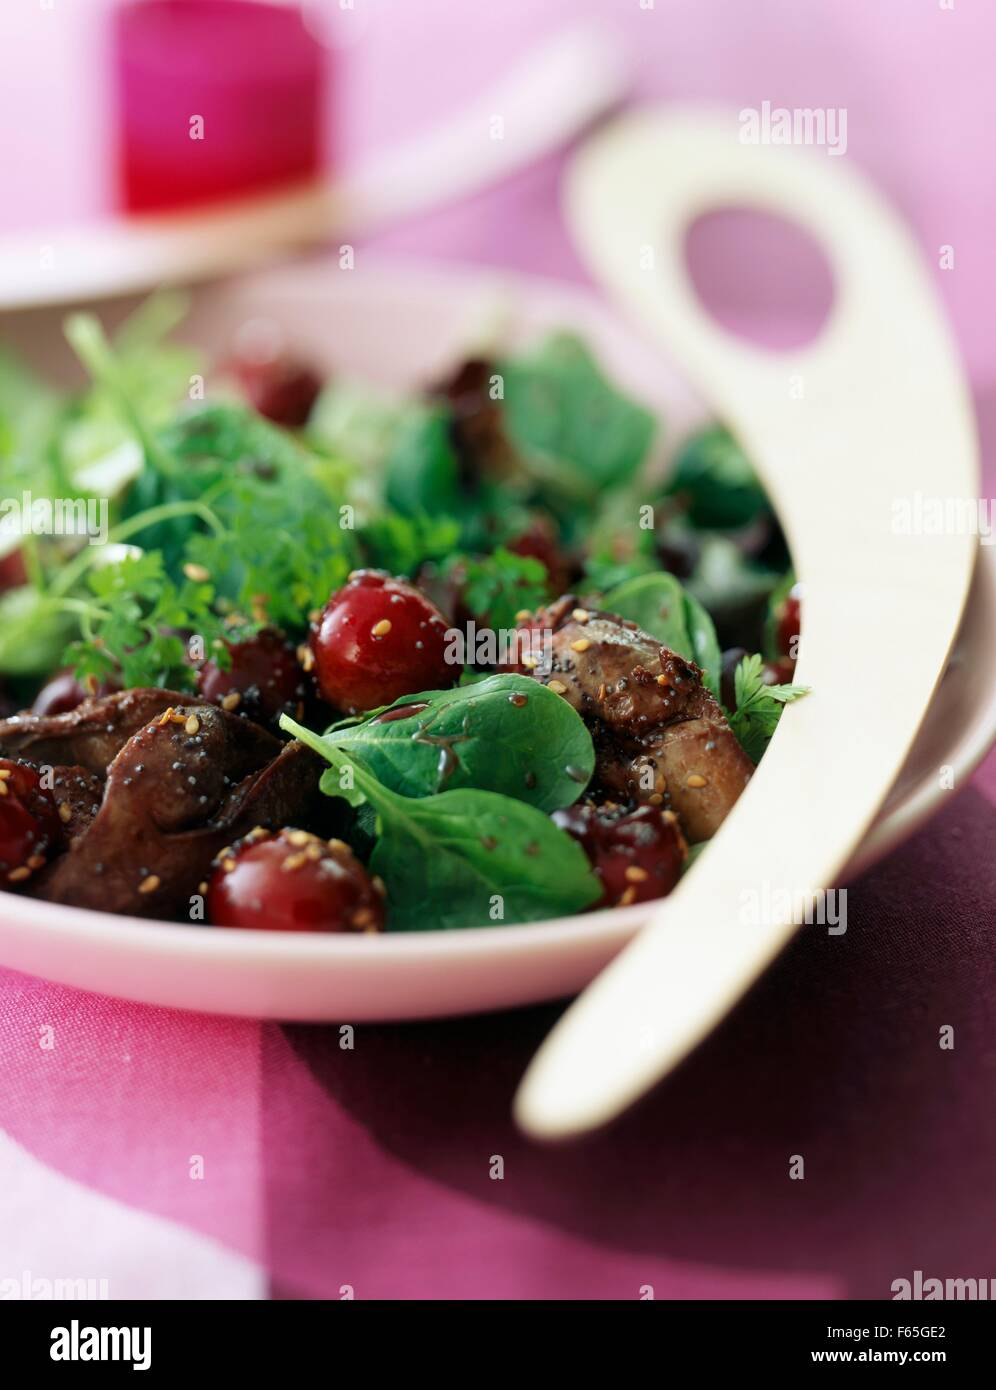 Mesclun, Geflügel Leber und Kirsche Salat Stockfoto